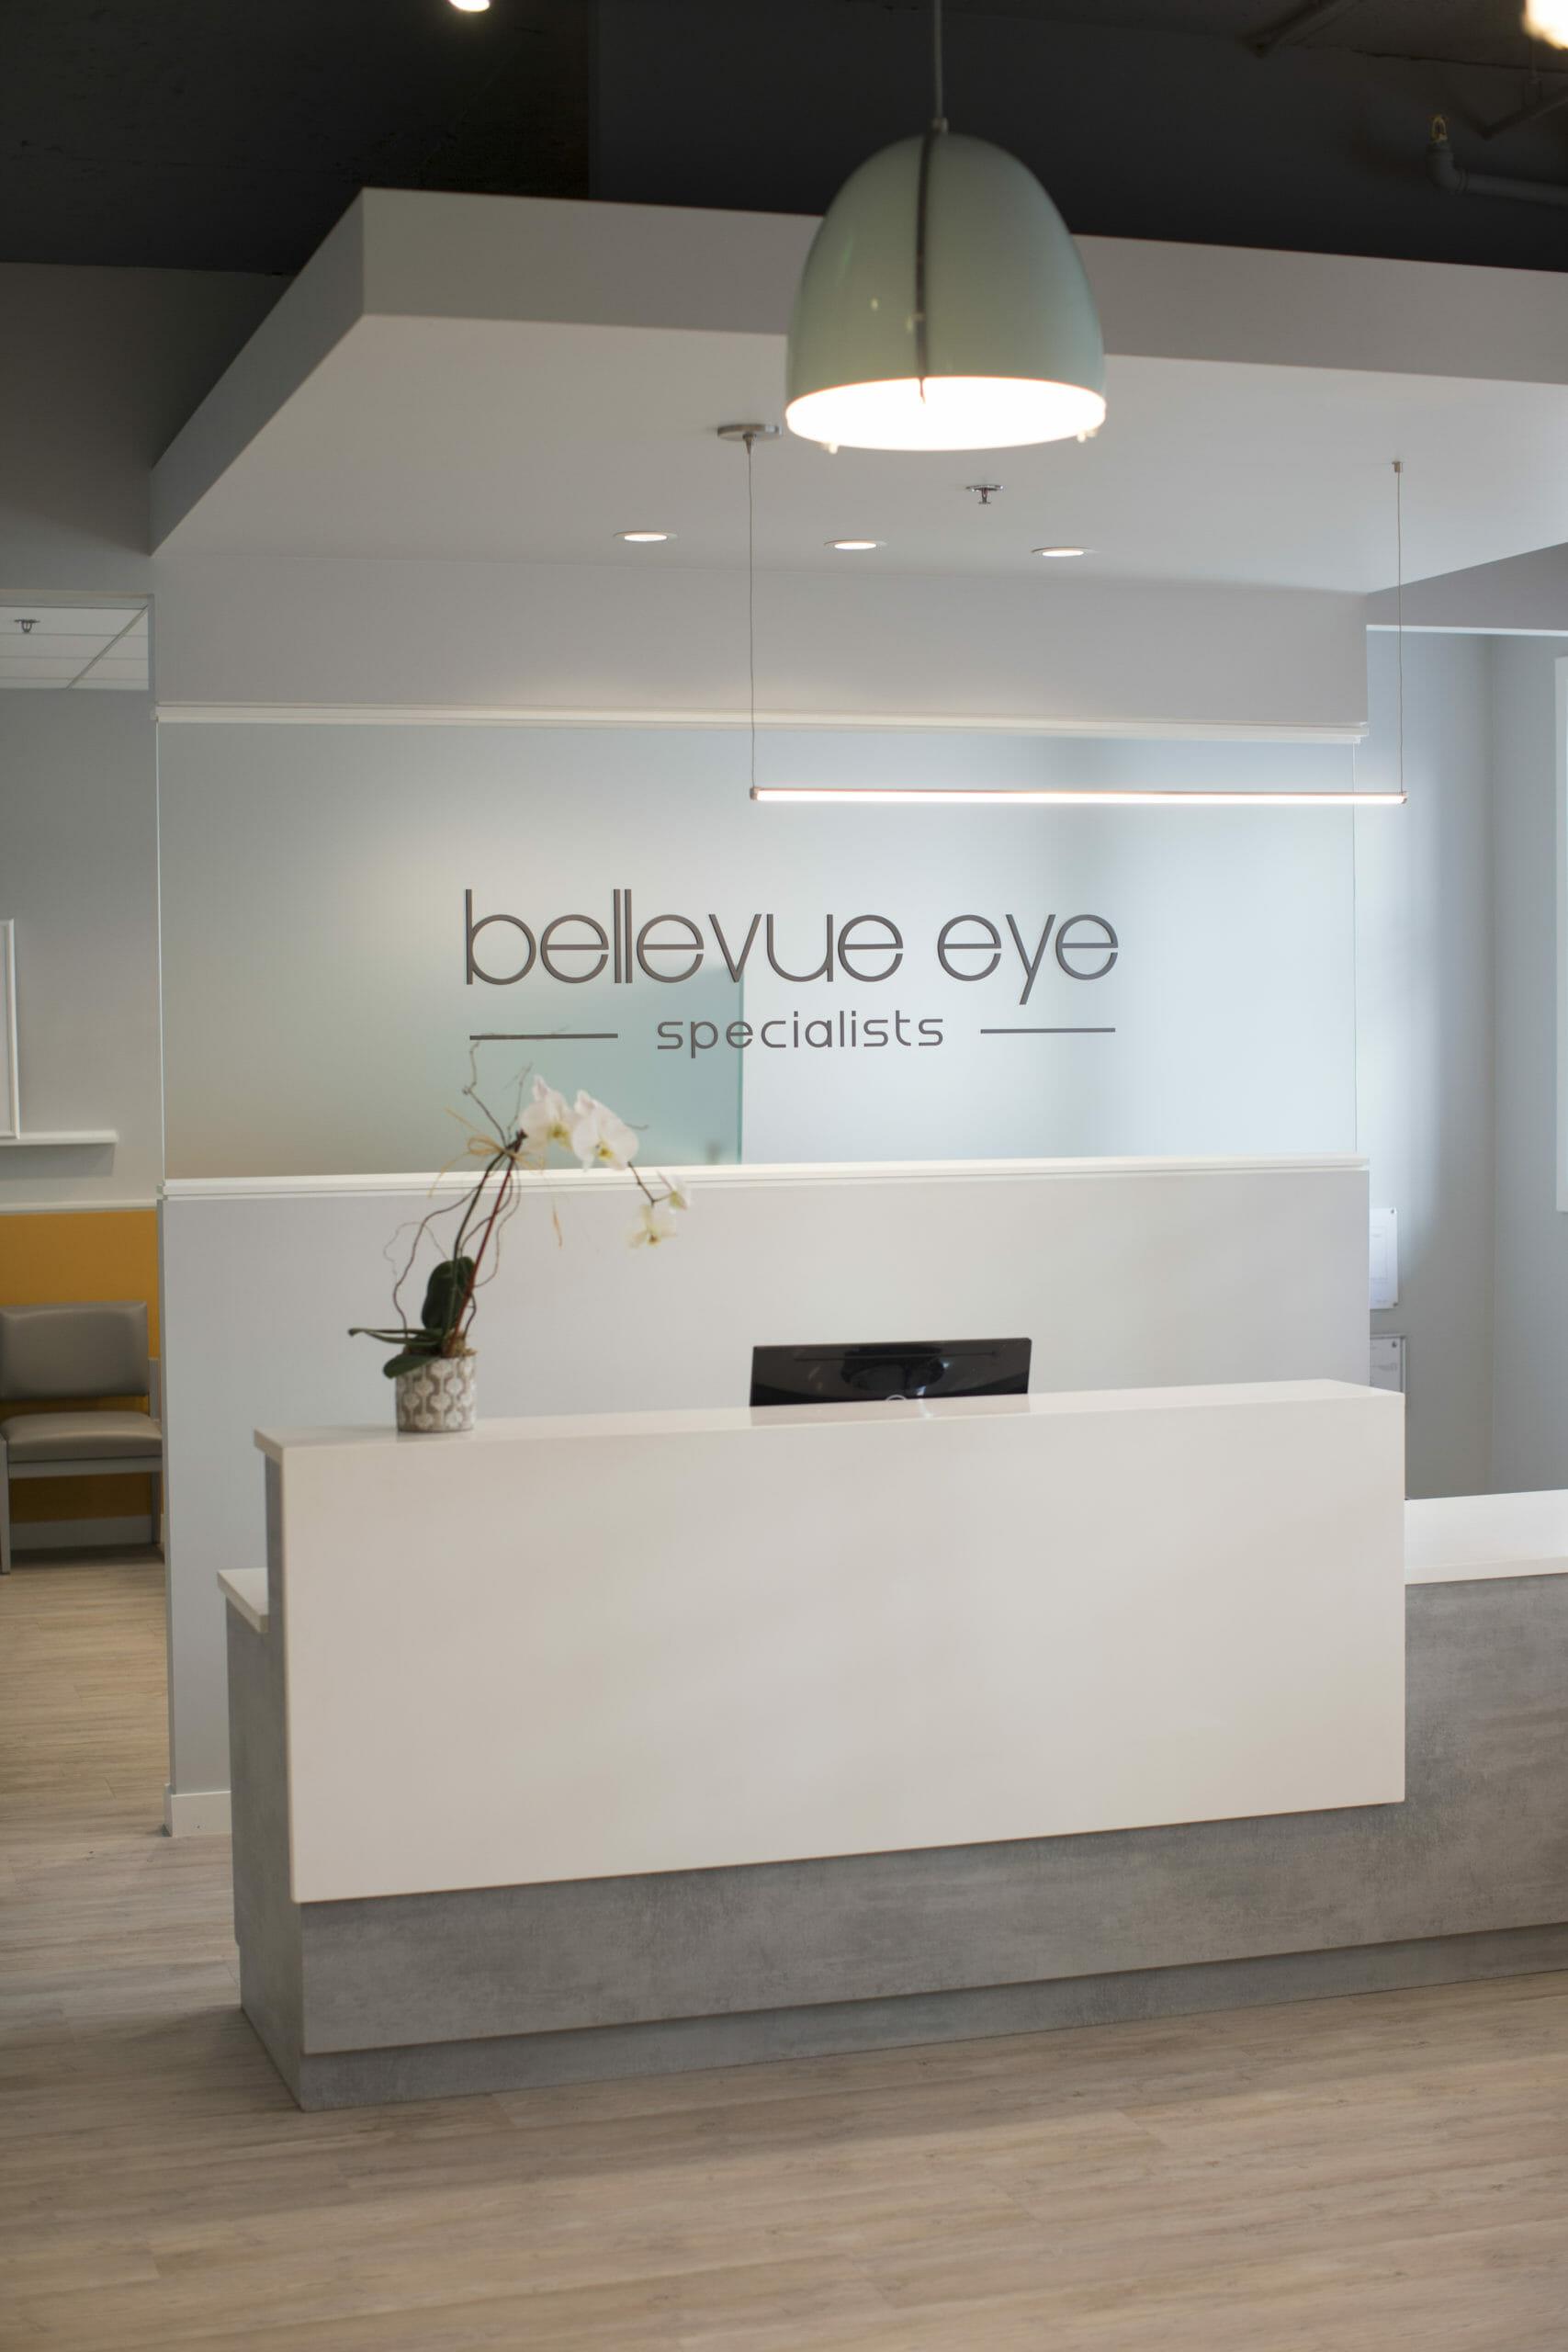 Issue-Free Eyewear Buying Experience